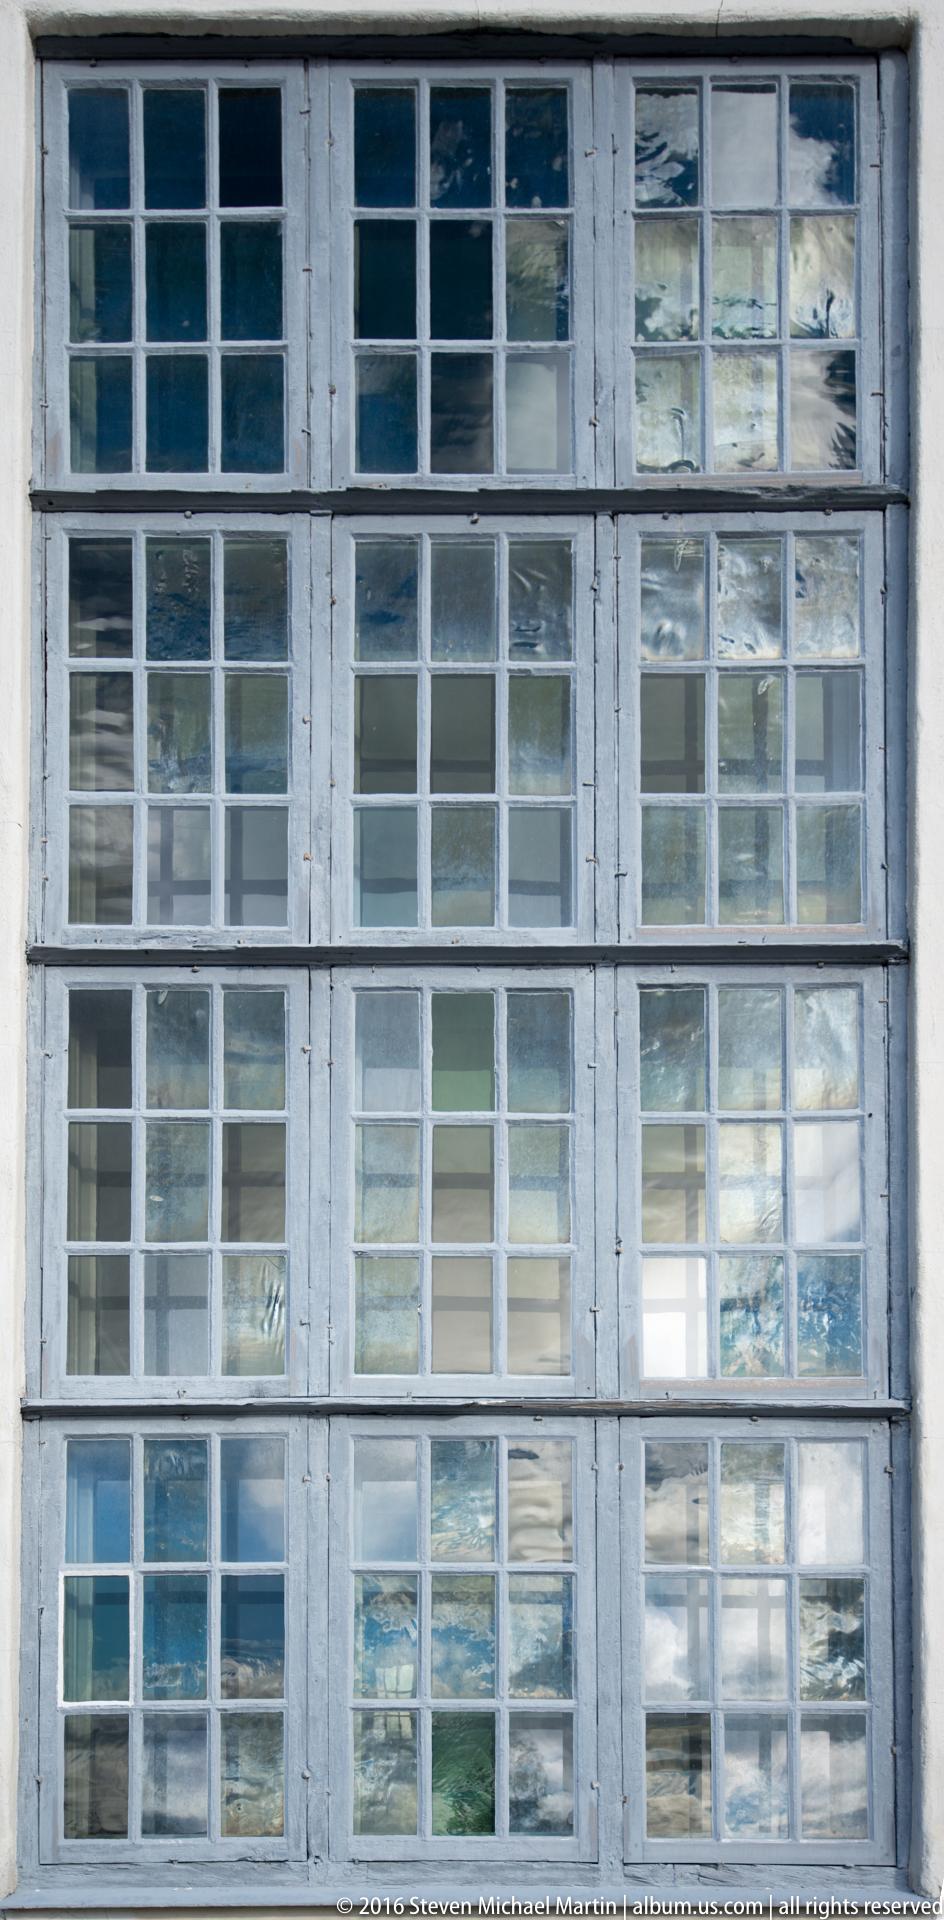 Roros Church window by Steven Michael Martin